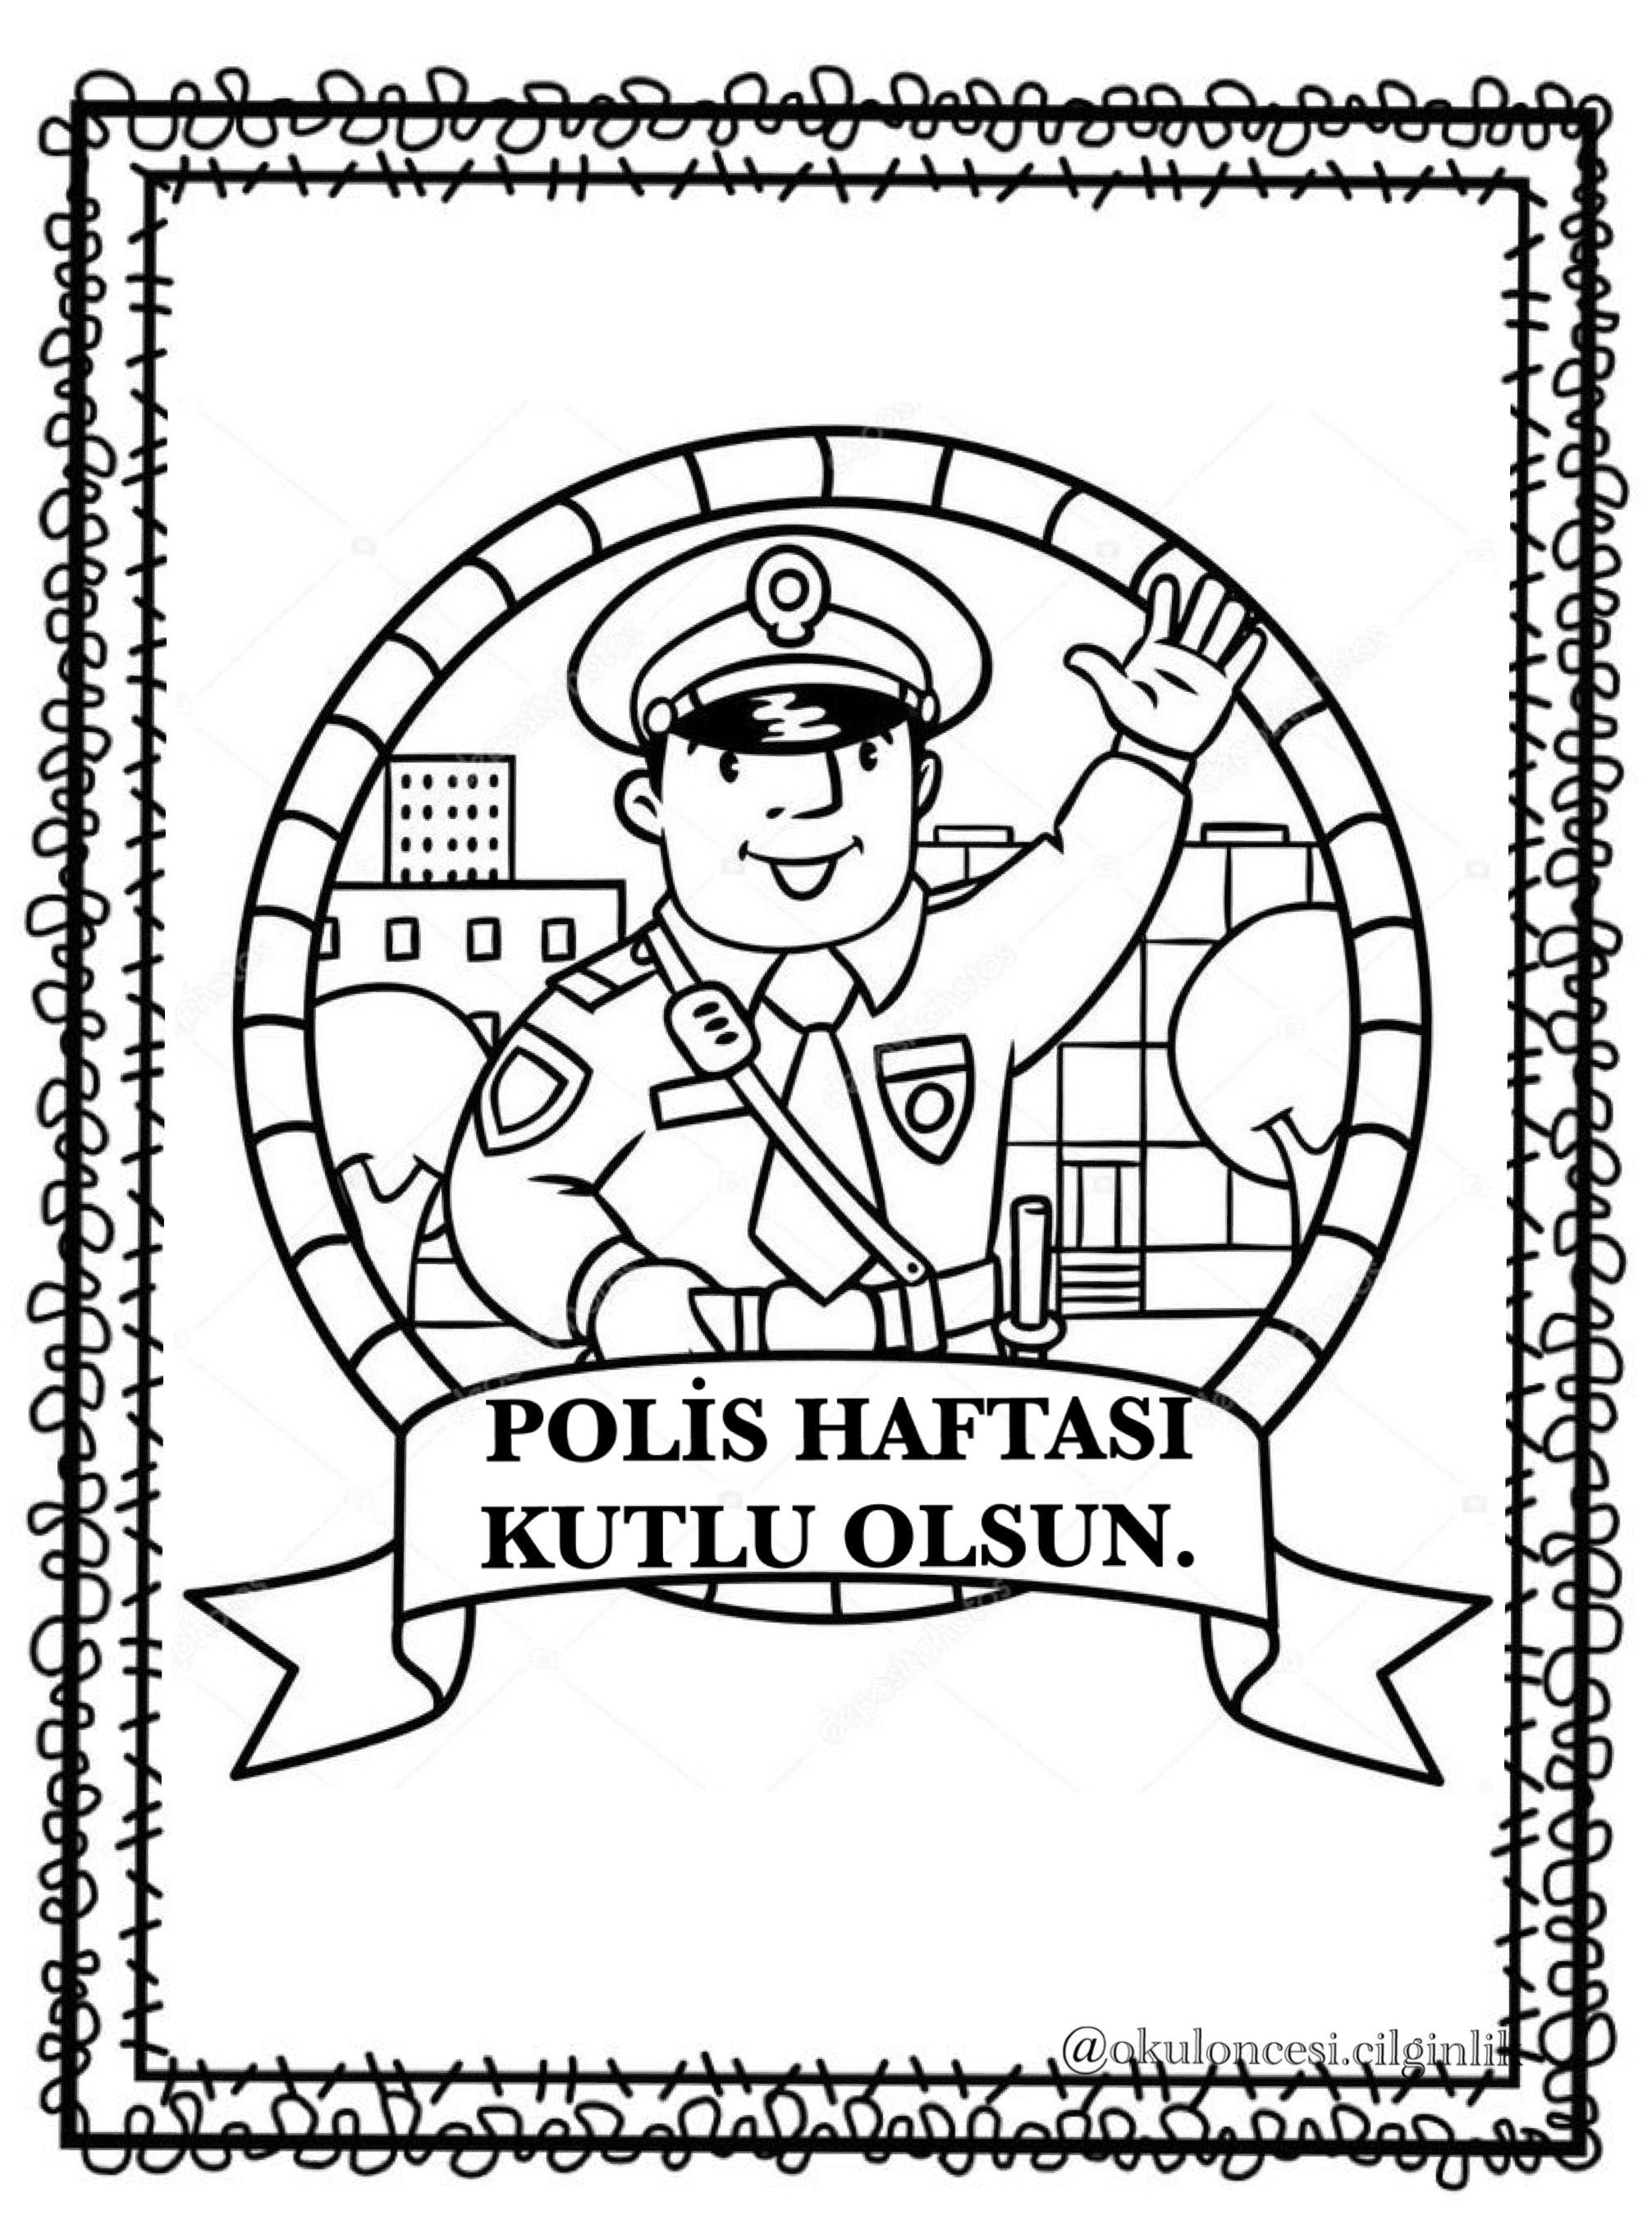 Esrayldrn Adli Kullanicinin Polis Haftasi Panosundaki Pin Boyama Sayfalari Trafik Polisi Okul Oncesi